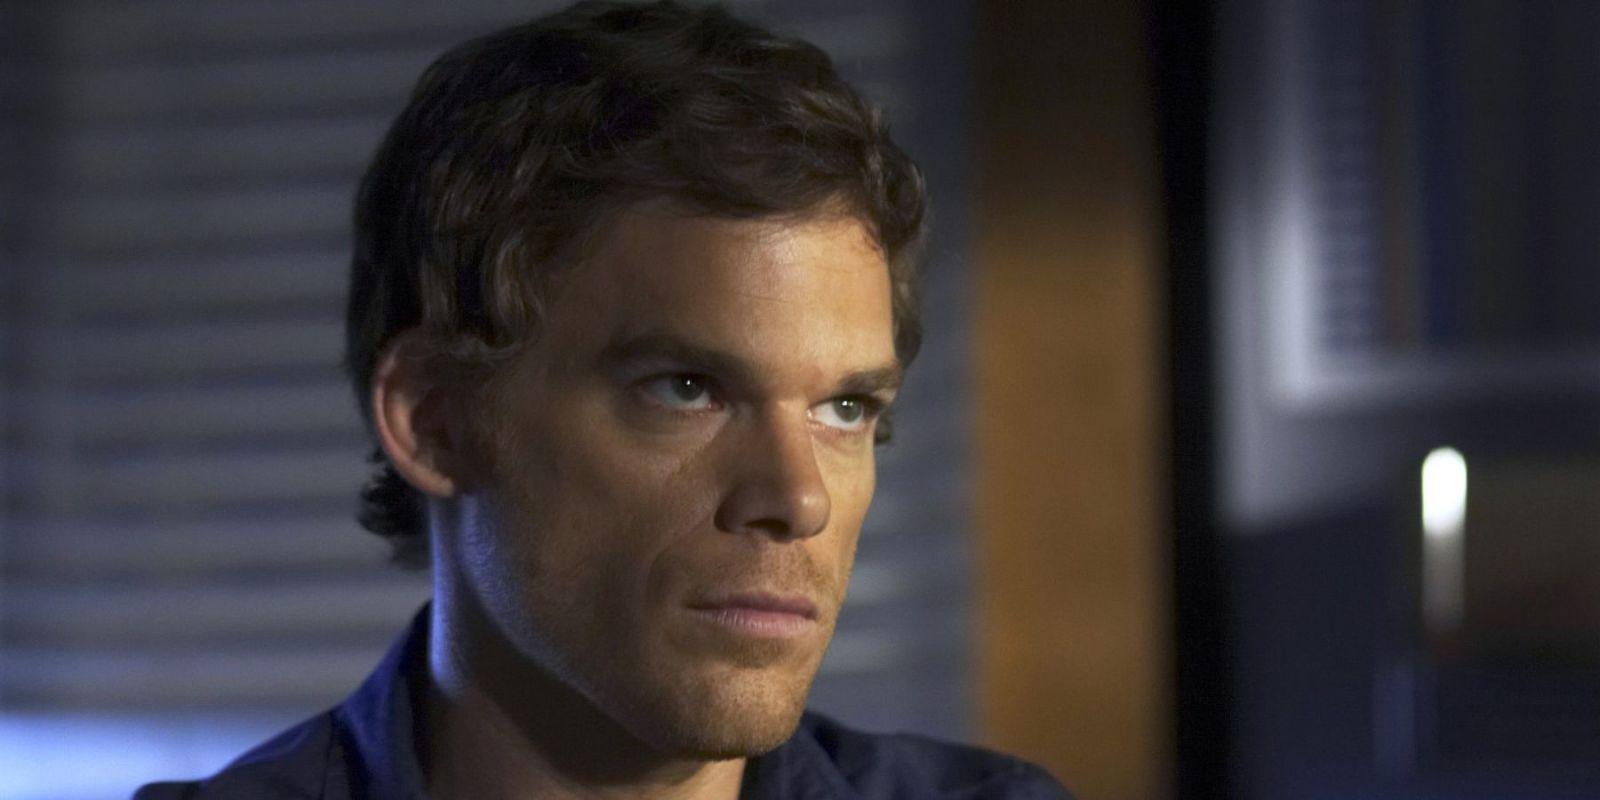 Dexter keaton dating